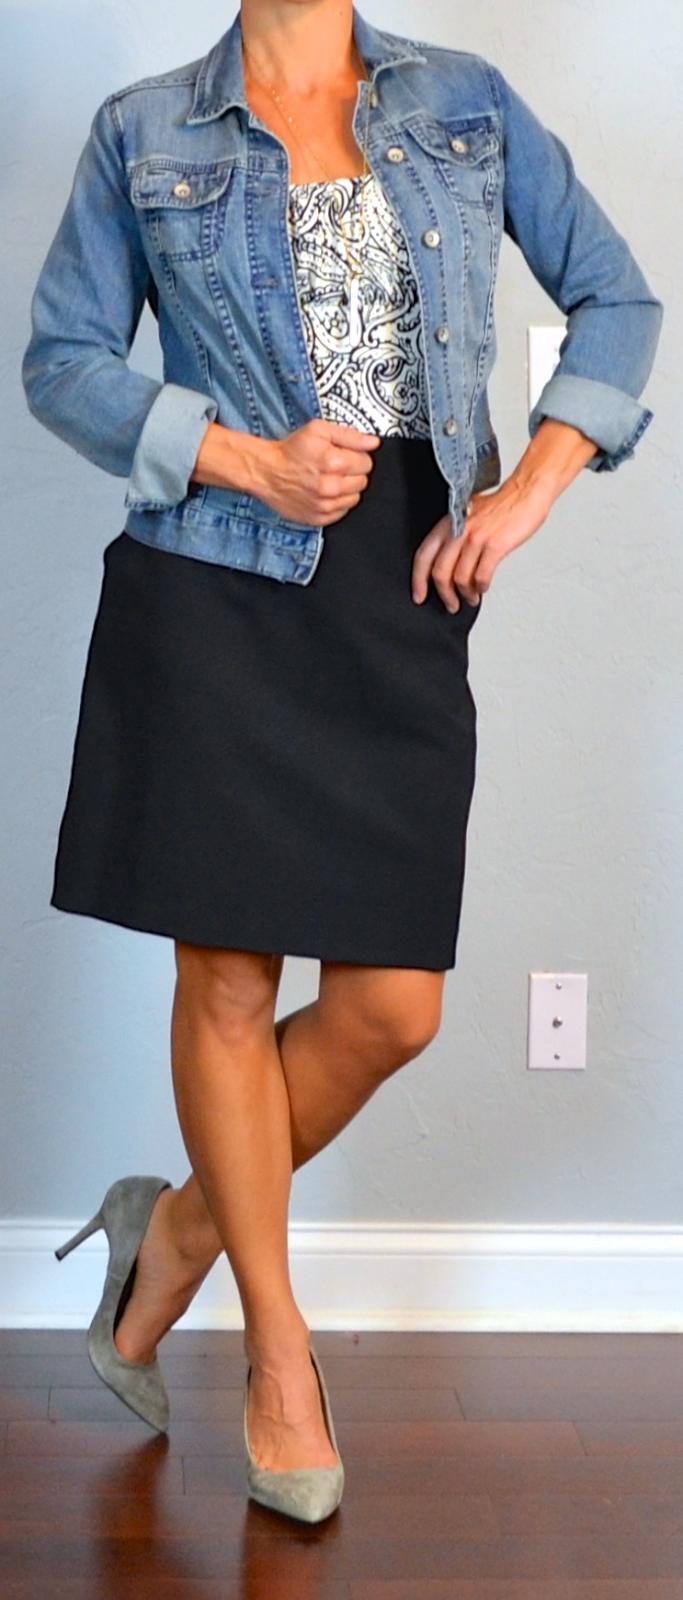 outfit post: print blouse, jean jacket, black pencil skirt ...